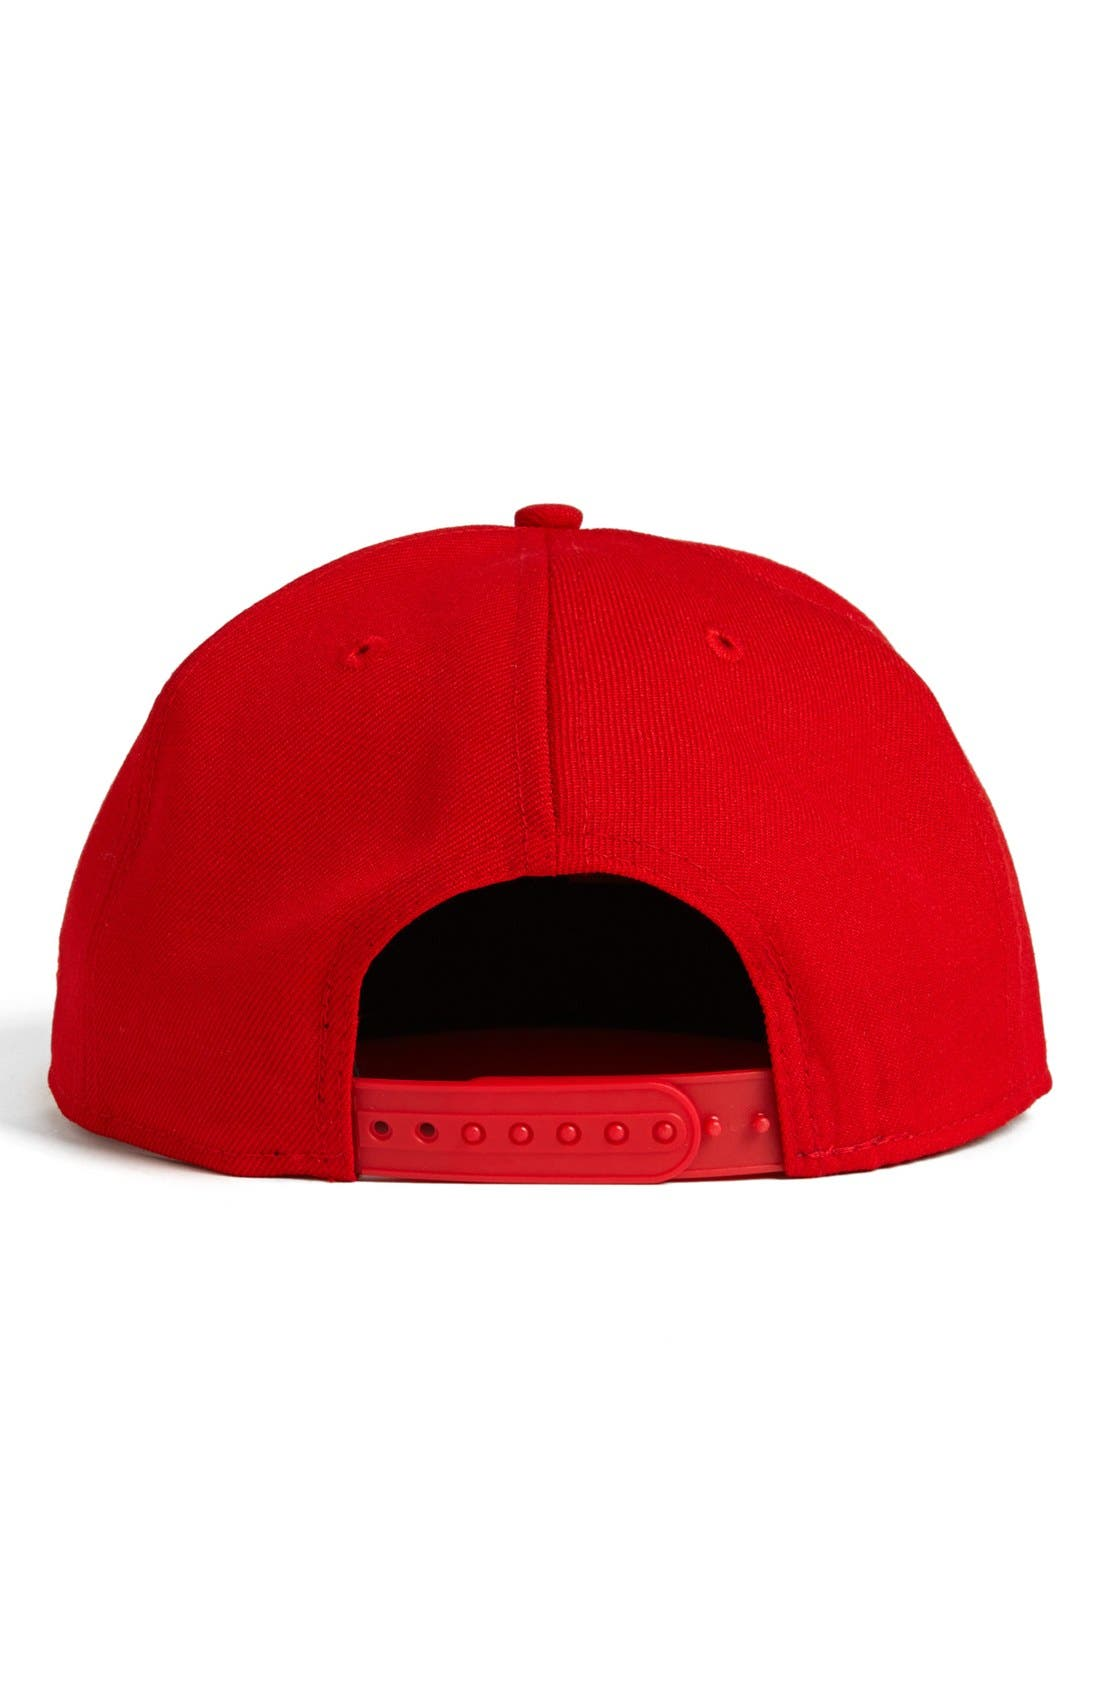 NEW ERA CAP, 'Vivre Sa Vie' Baseball Cap, Alternate thumbnail 4, color, 600